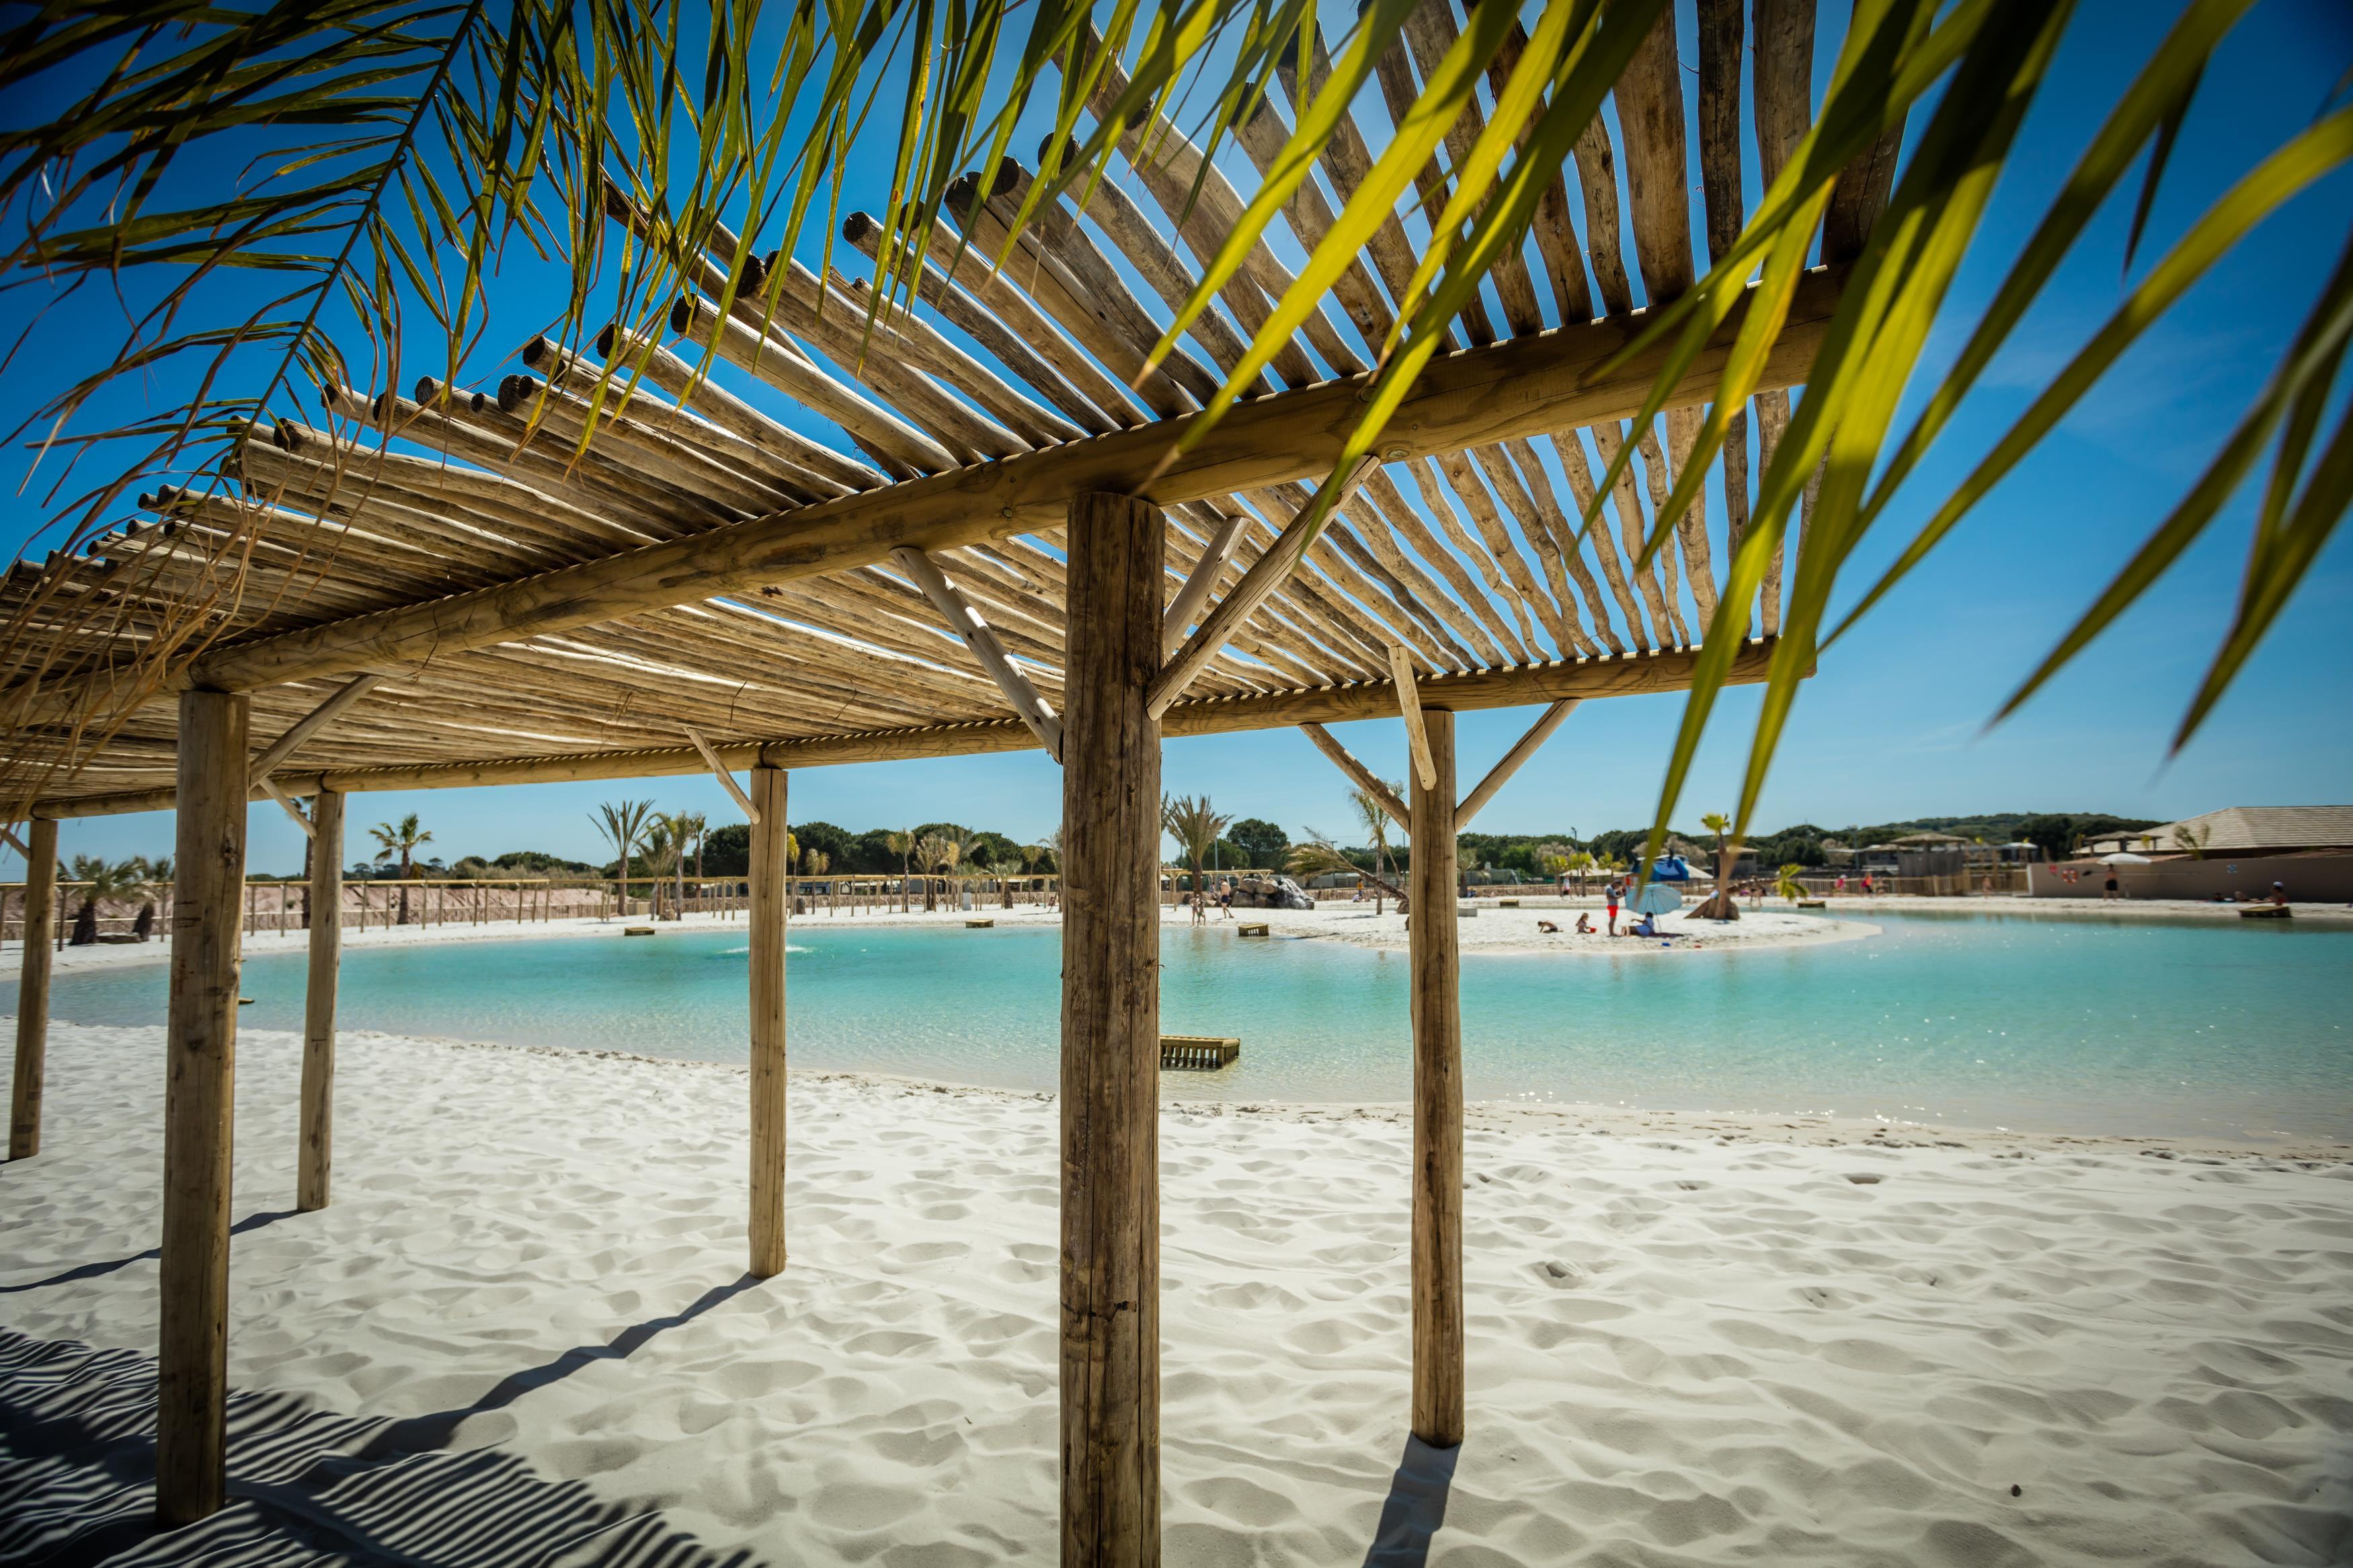 Lagunenstrand Überdachung Sonnenschirm Sand Meer Erholung